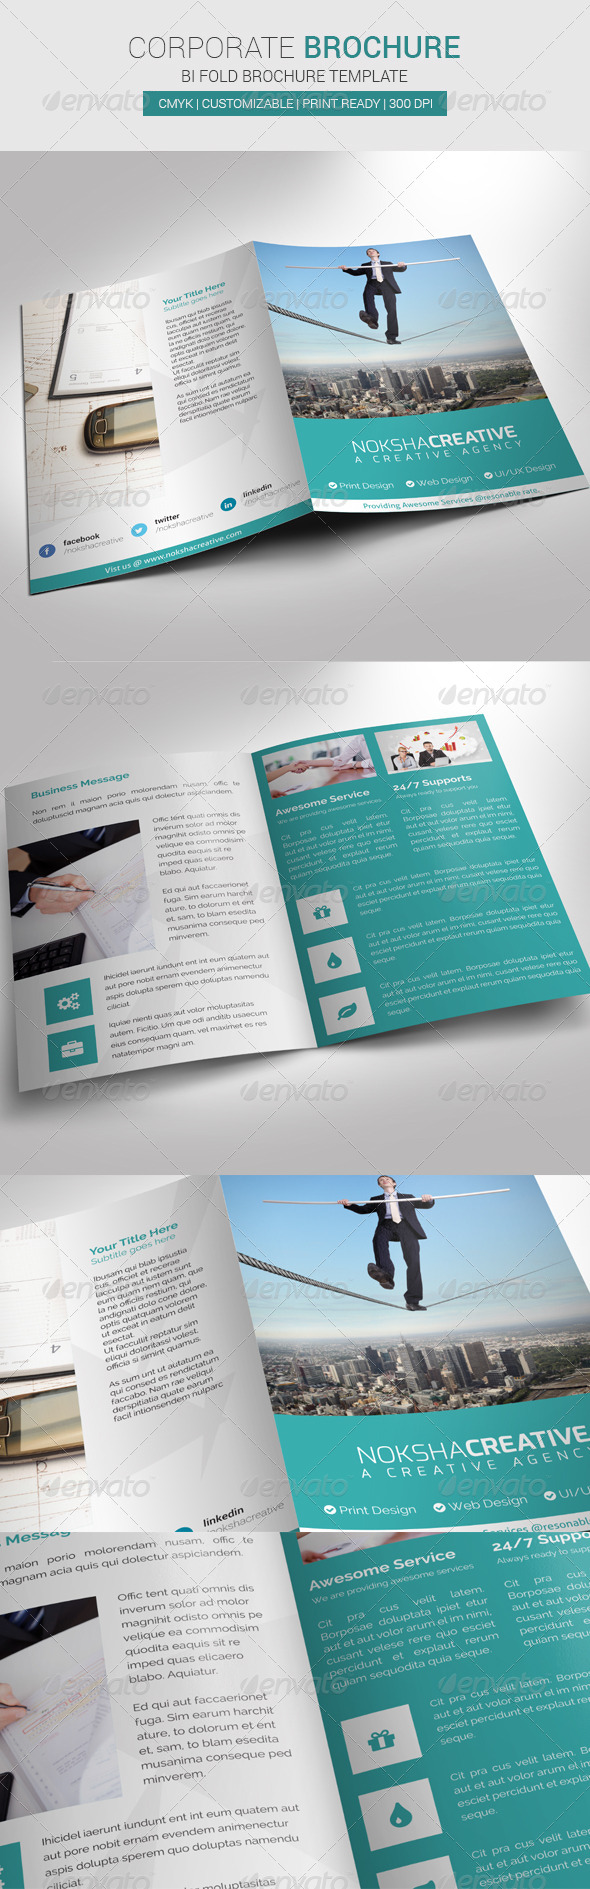 Corporate bi fold brochure graphicriver for Bi fold brochure template illustrator